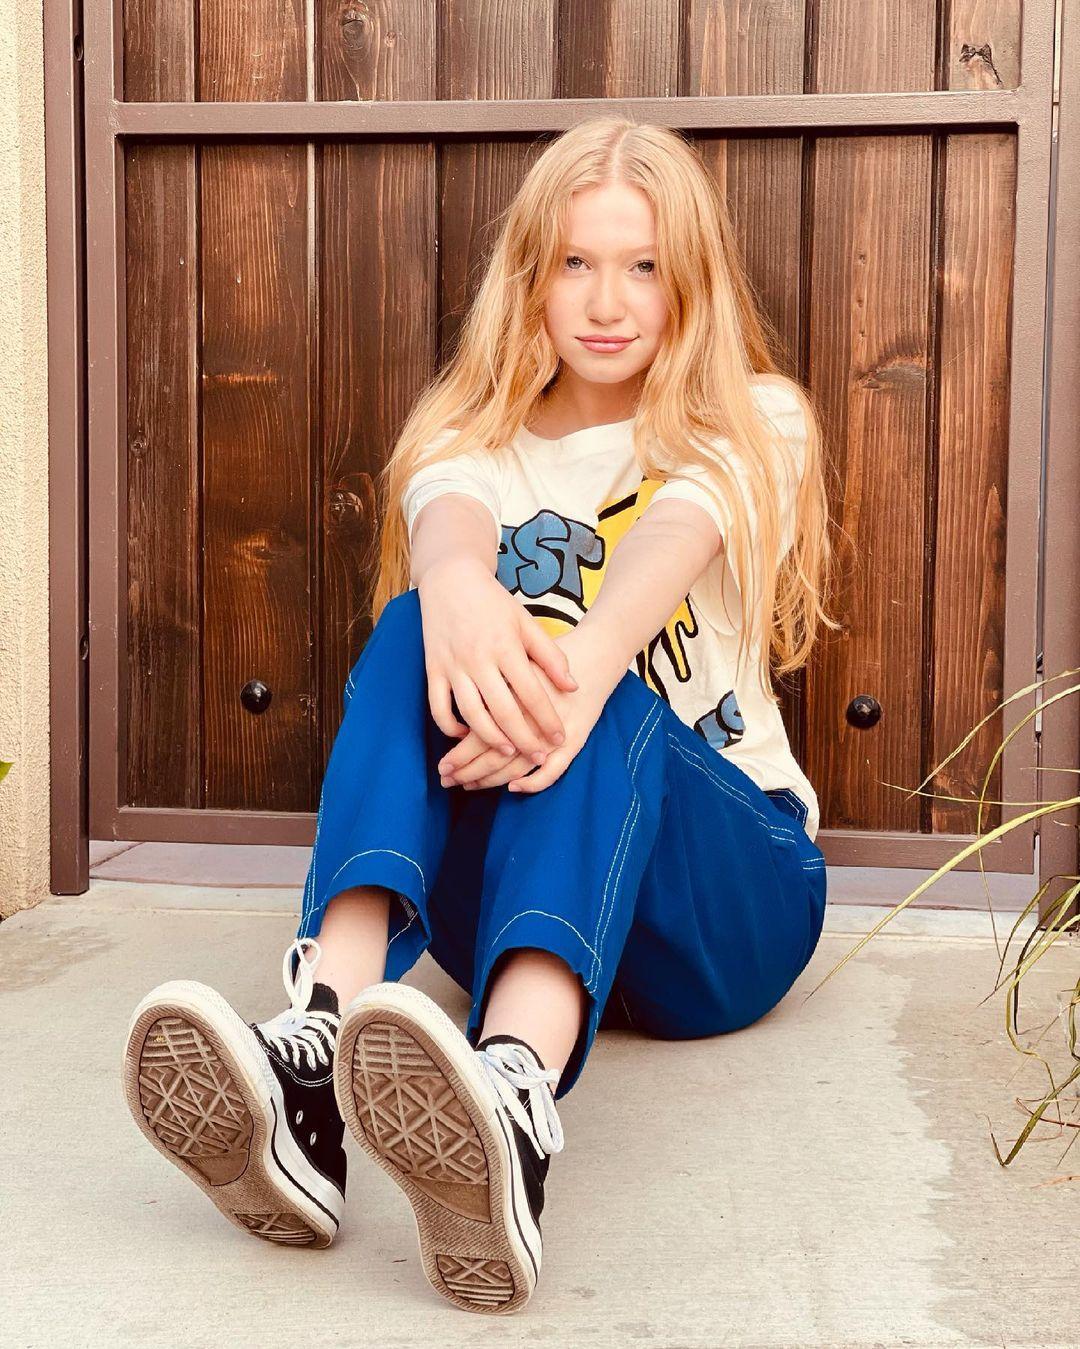 Abigail-Zoe-Lewis-Wallpapers-Insta-Fit-Bio-11